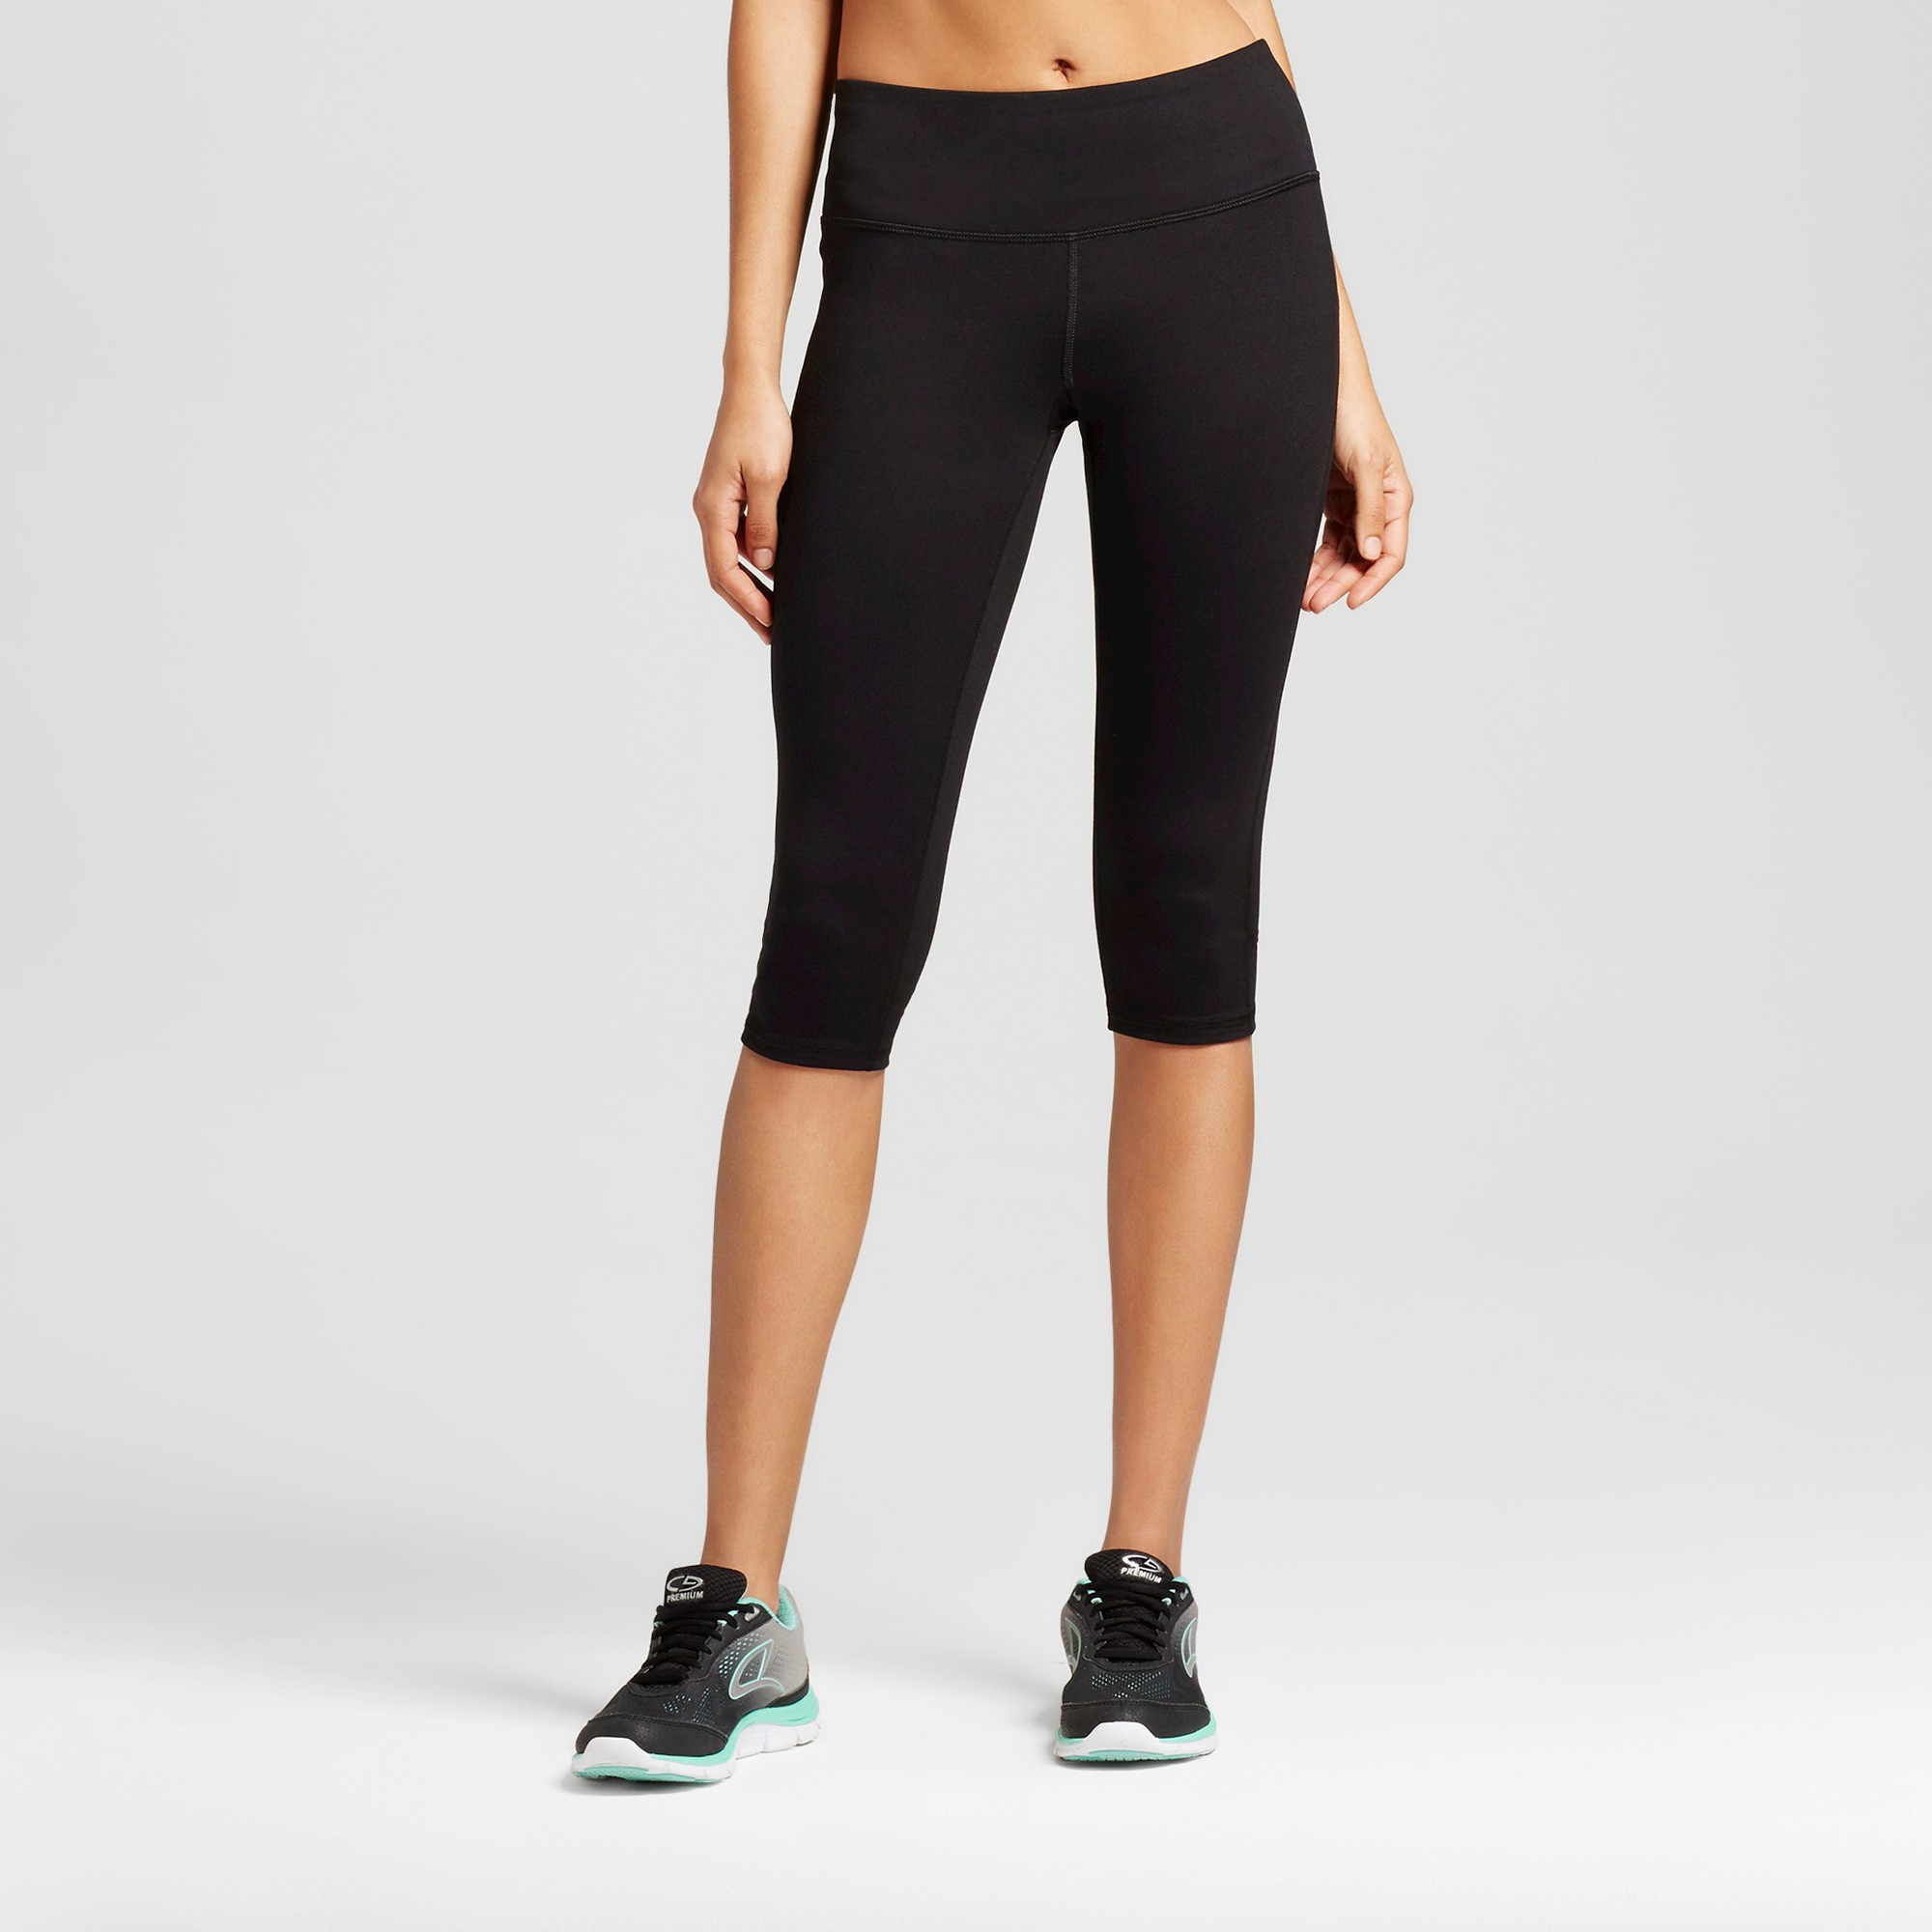 720a719d6 Women s Everyday Knee Length Leggings - C9 Champion Black L ...